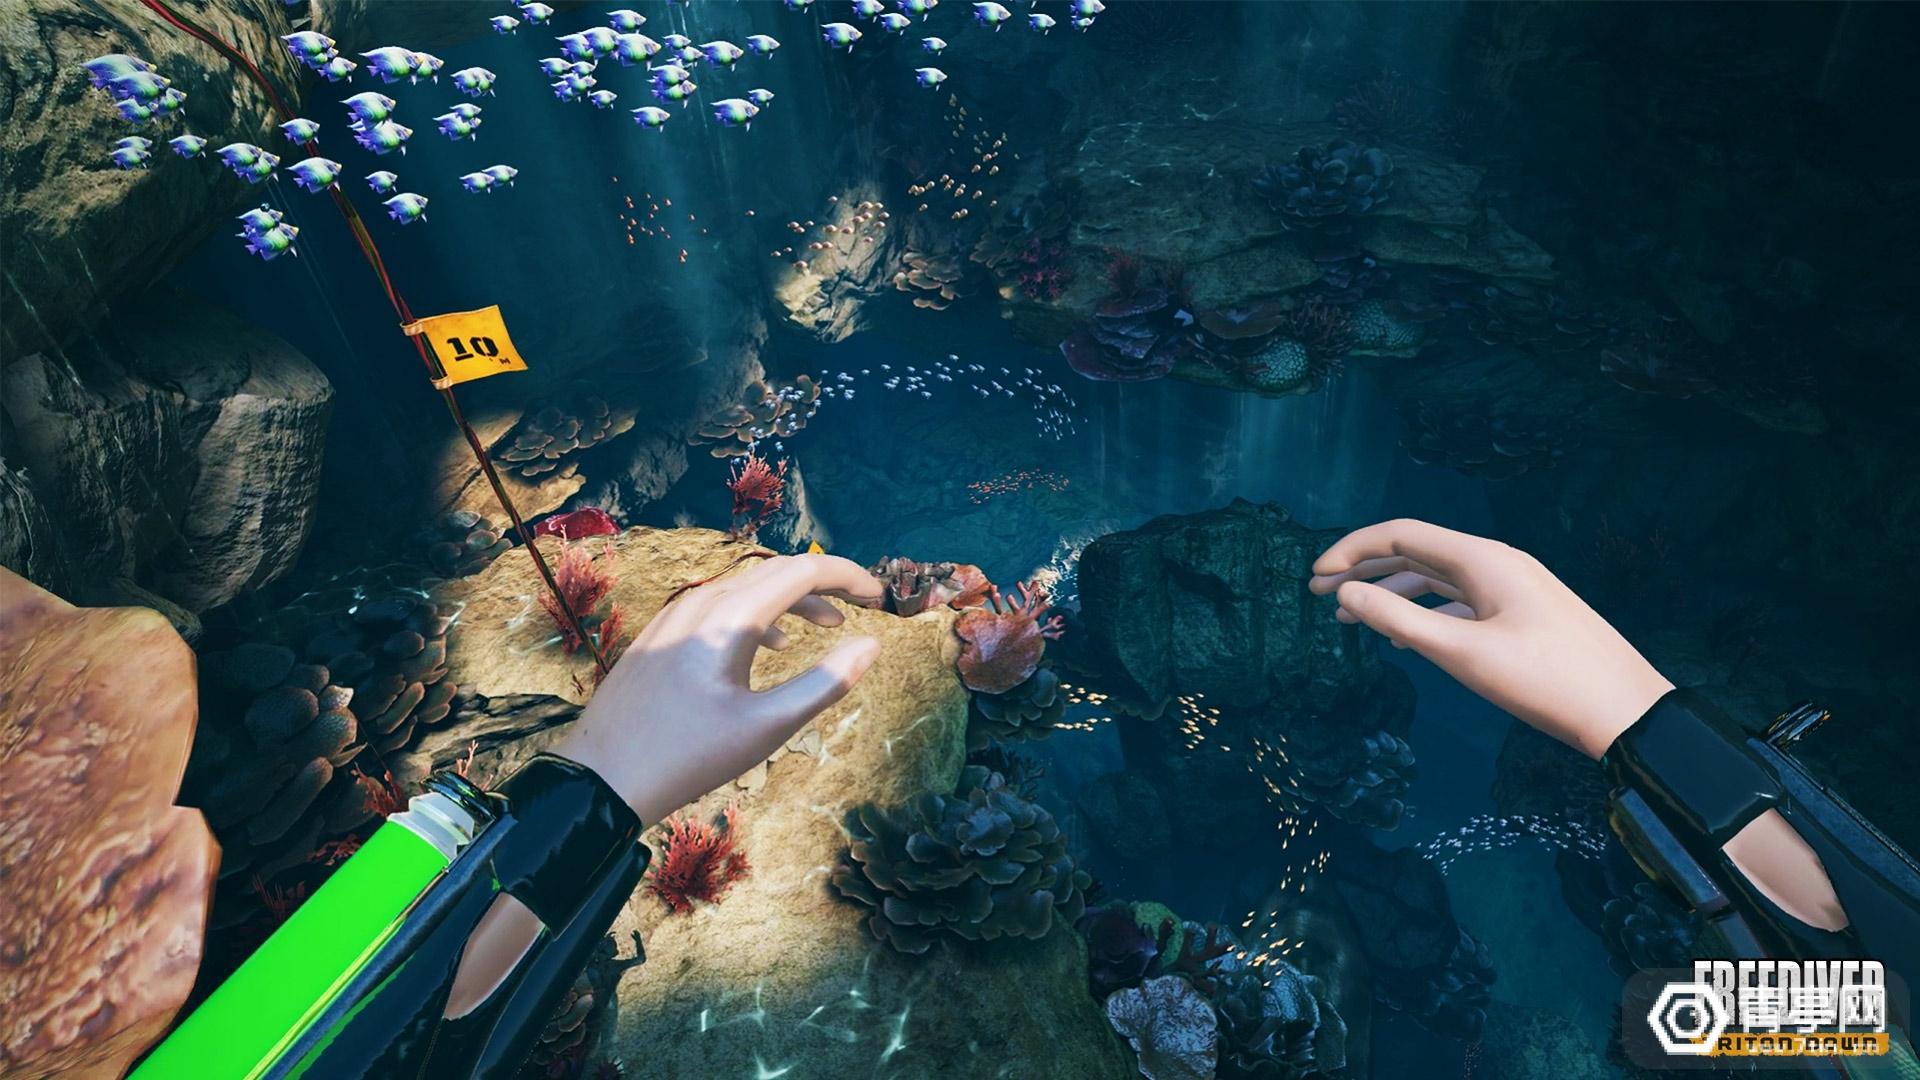 水下VR冒险游戏《FREEDIVER》发布Quest和PS VR版